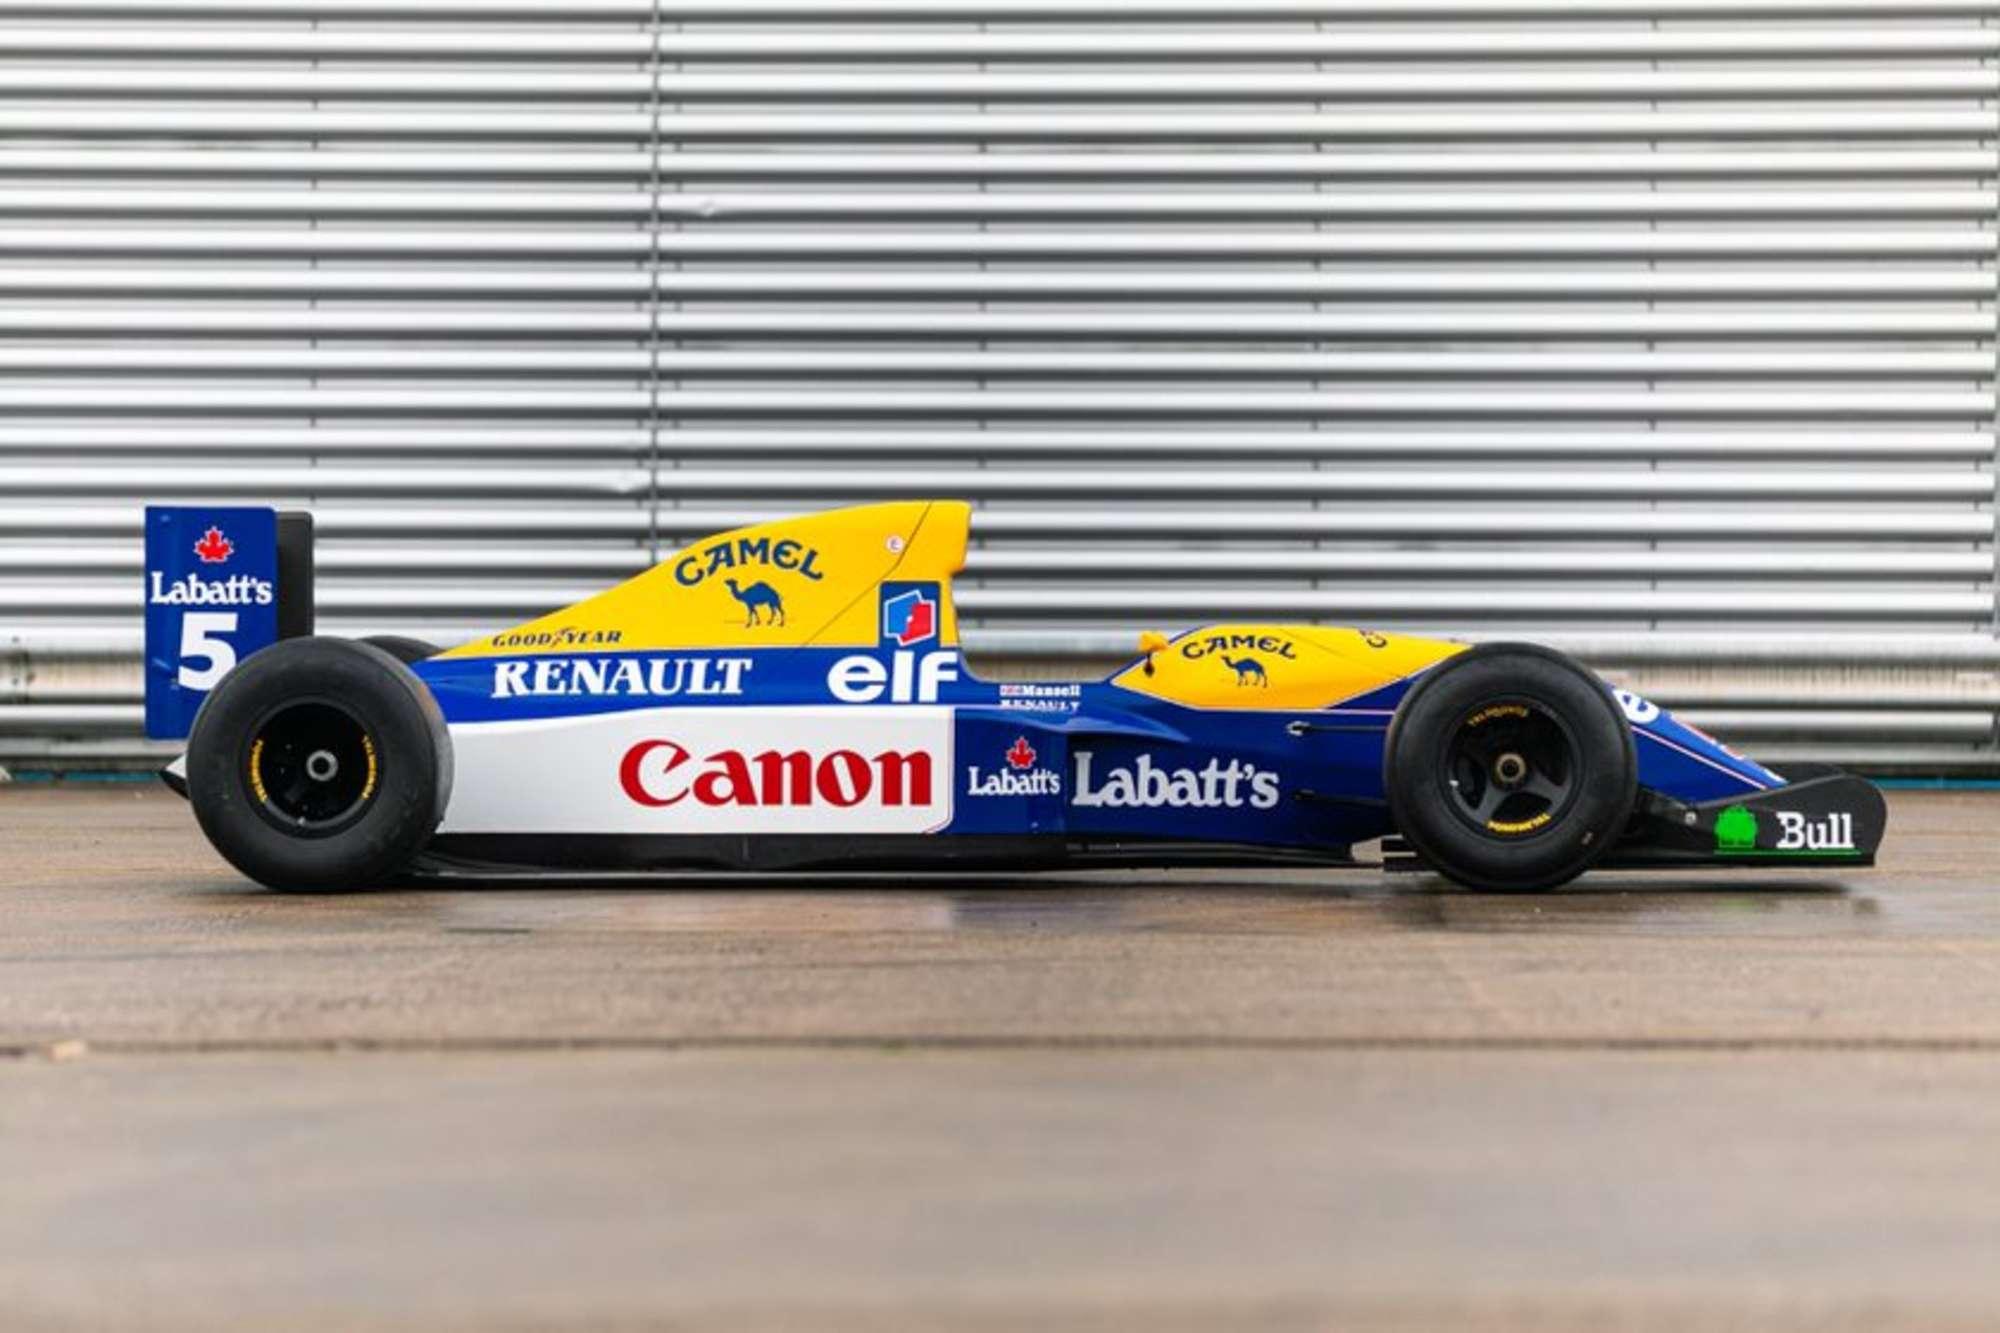 Williams FW14 show car 8